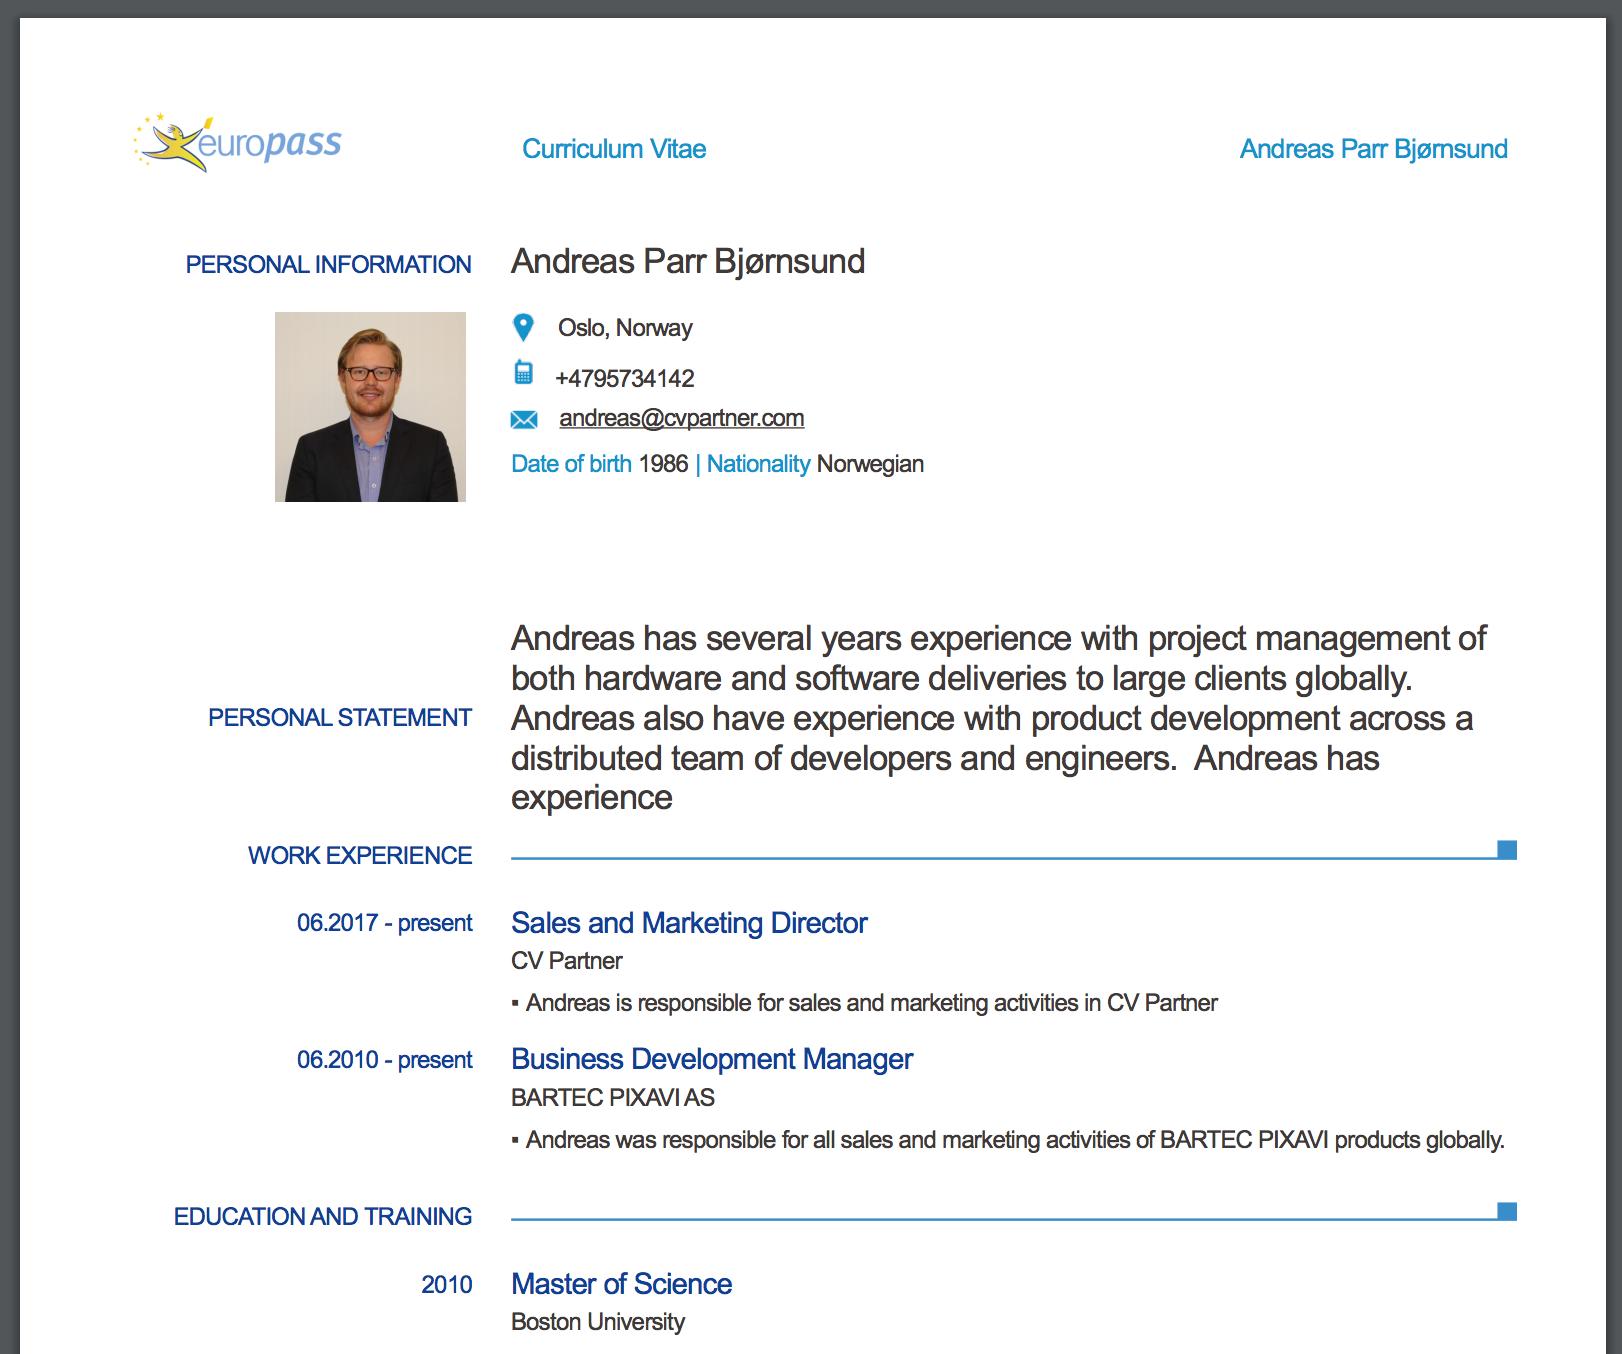 Resume Format Model Cv Europass blogspotcom - induced.info